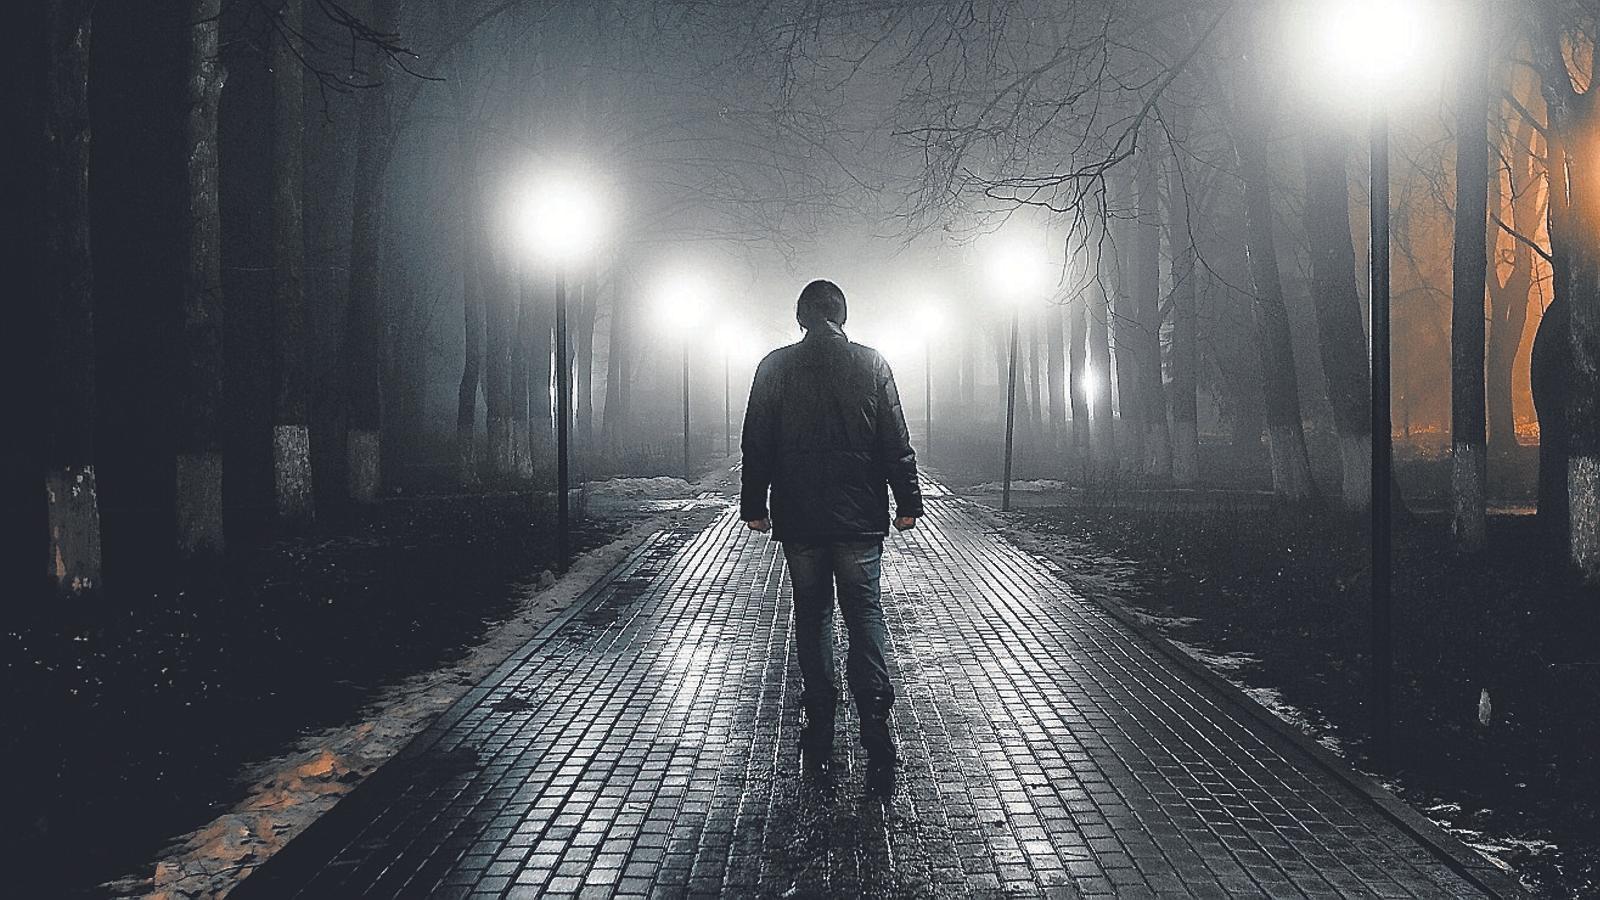 Caminant en la foscor